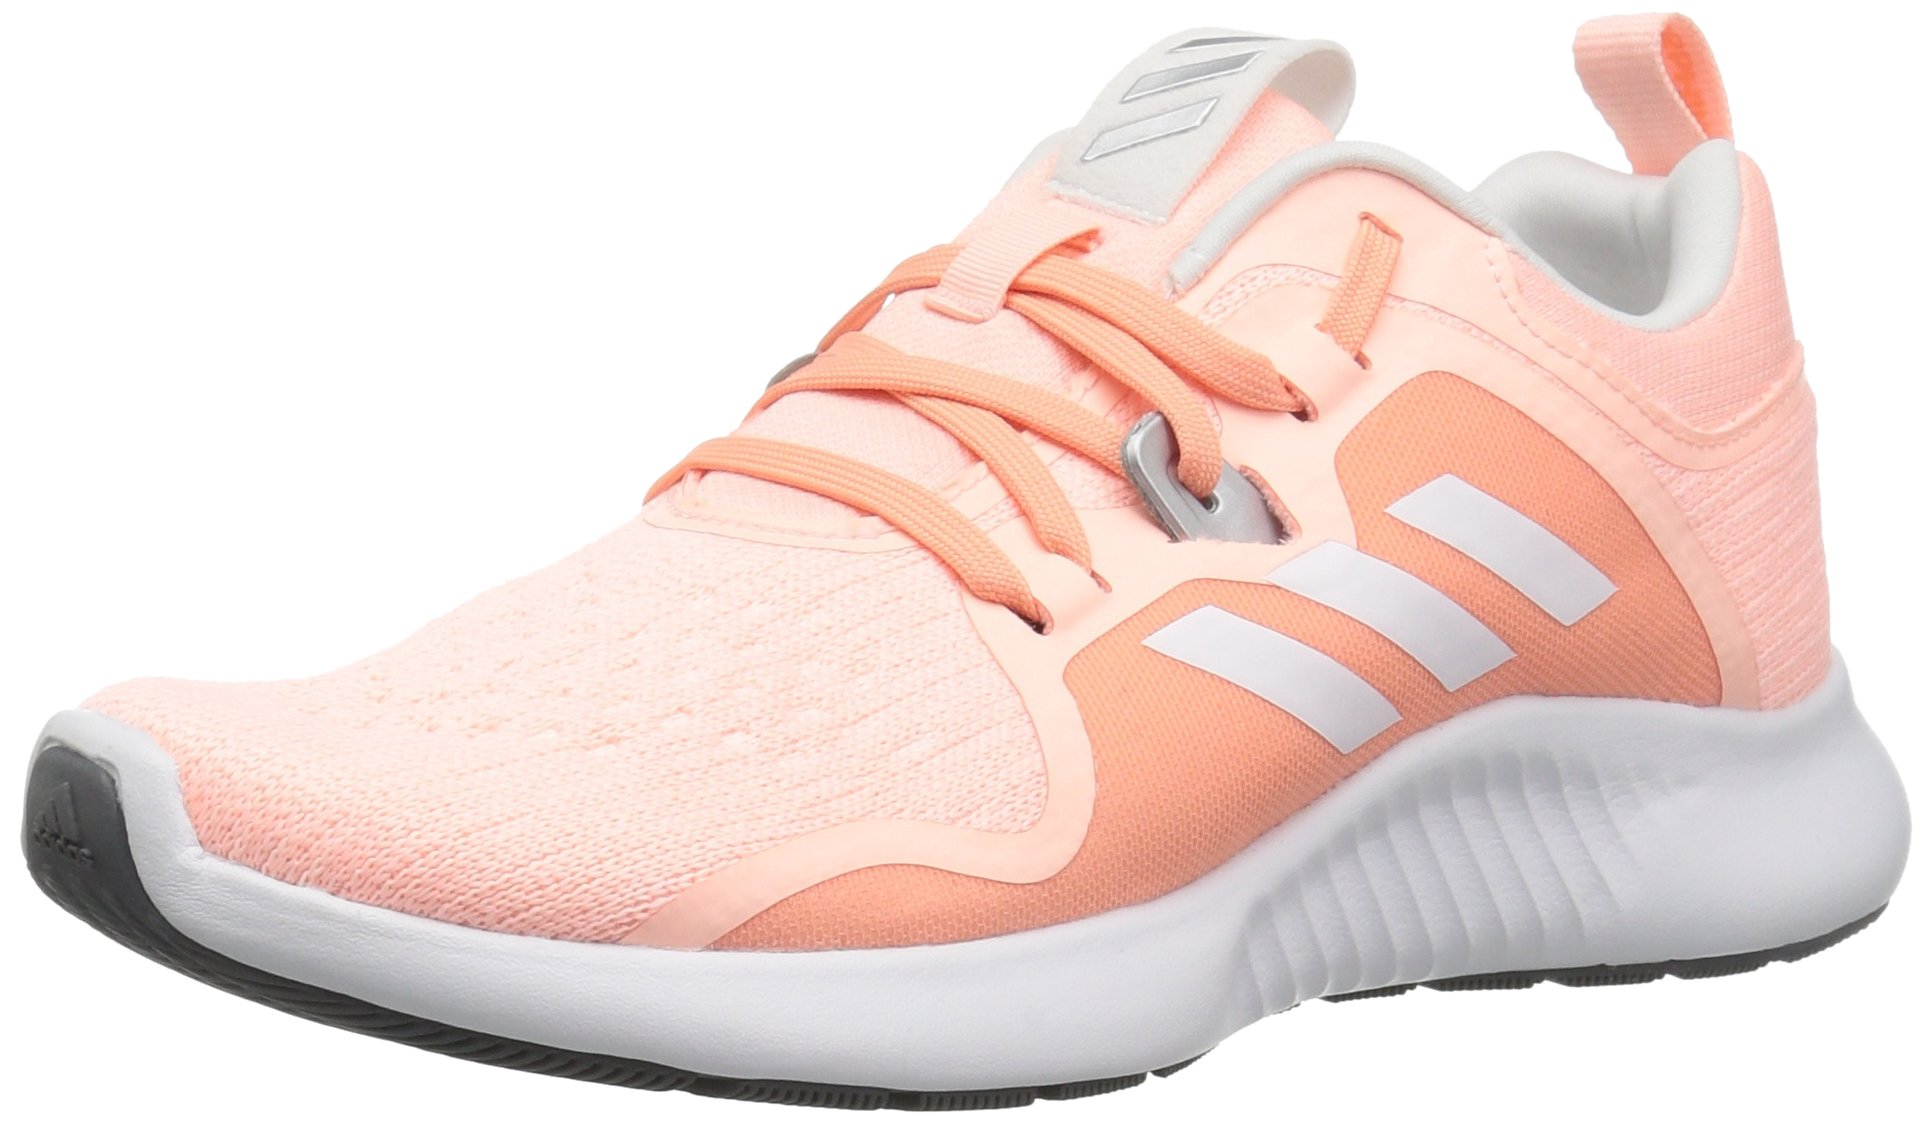 adidas Women's EdgeBounce Running Shoe Clear Orange/White/Copper Metallic 5 M US